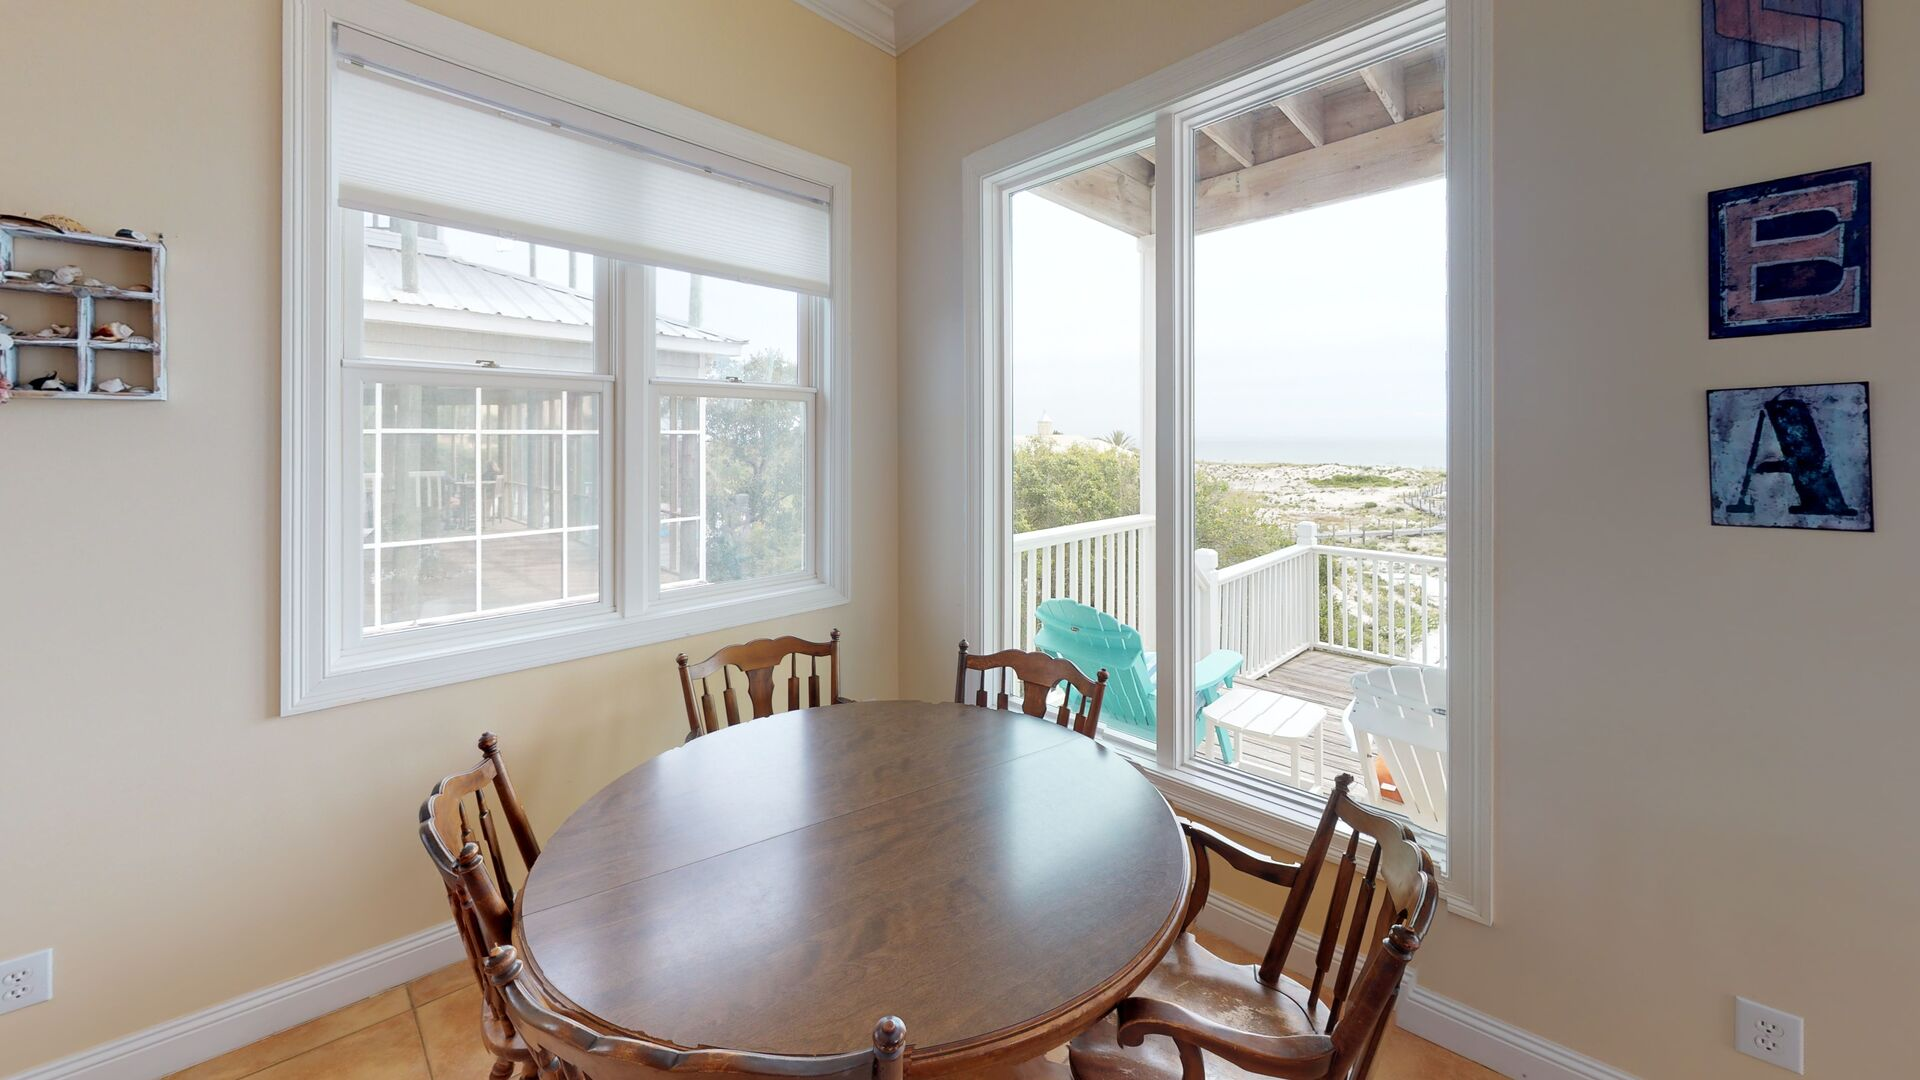 Windows Offer Plenty of Natural Light in Dining Room.